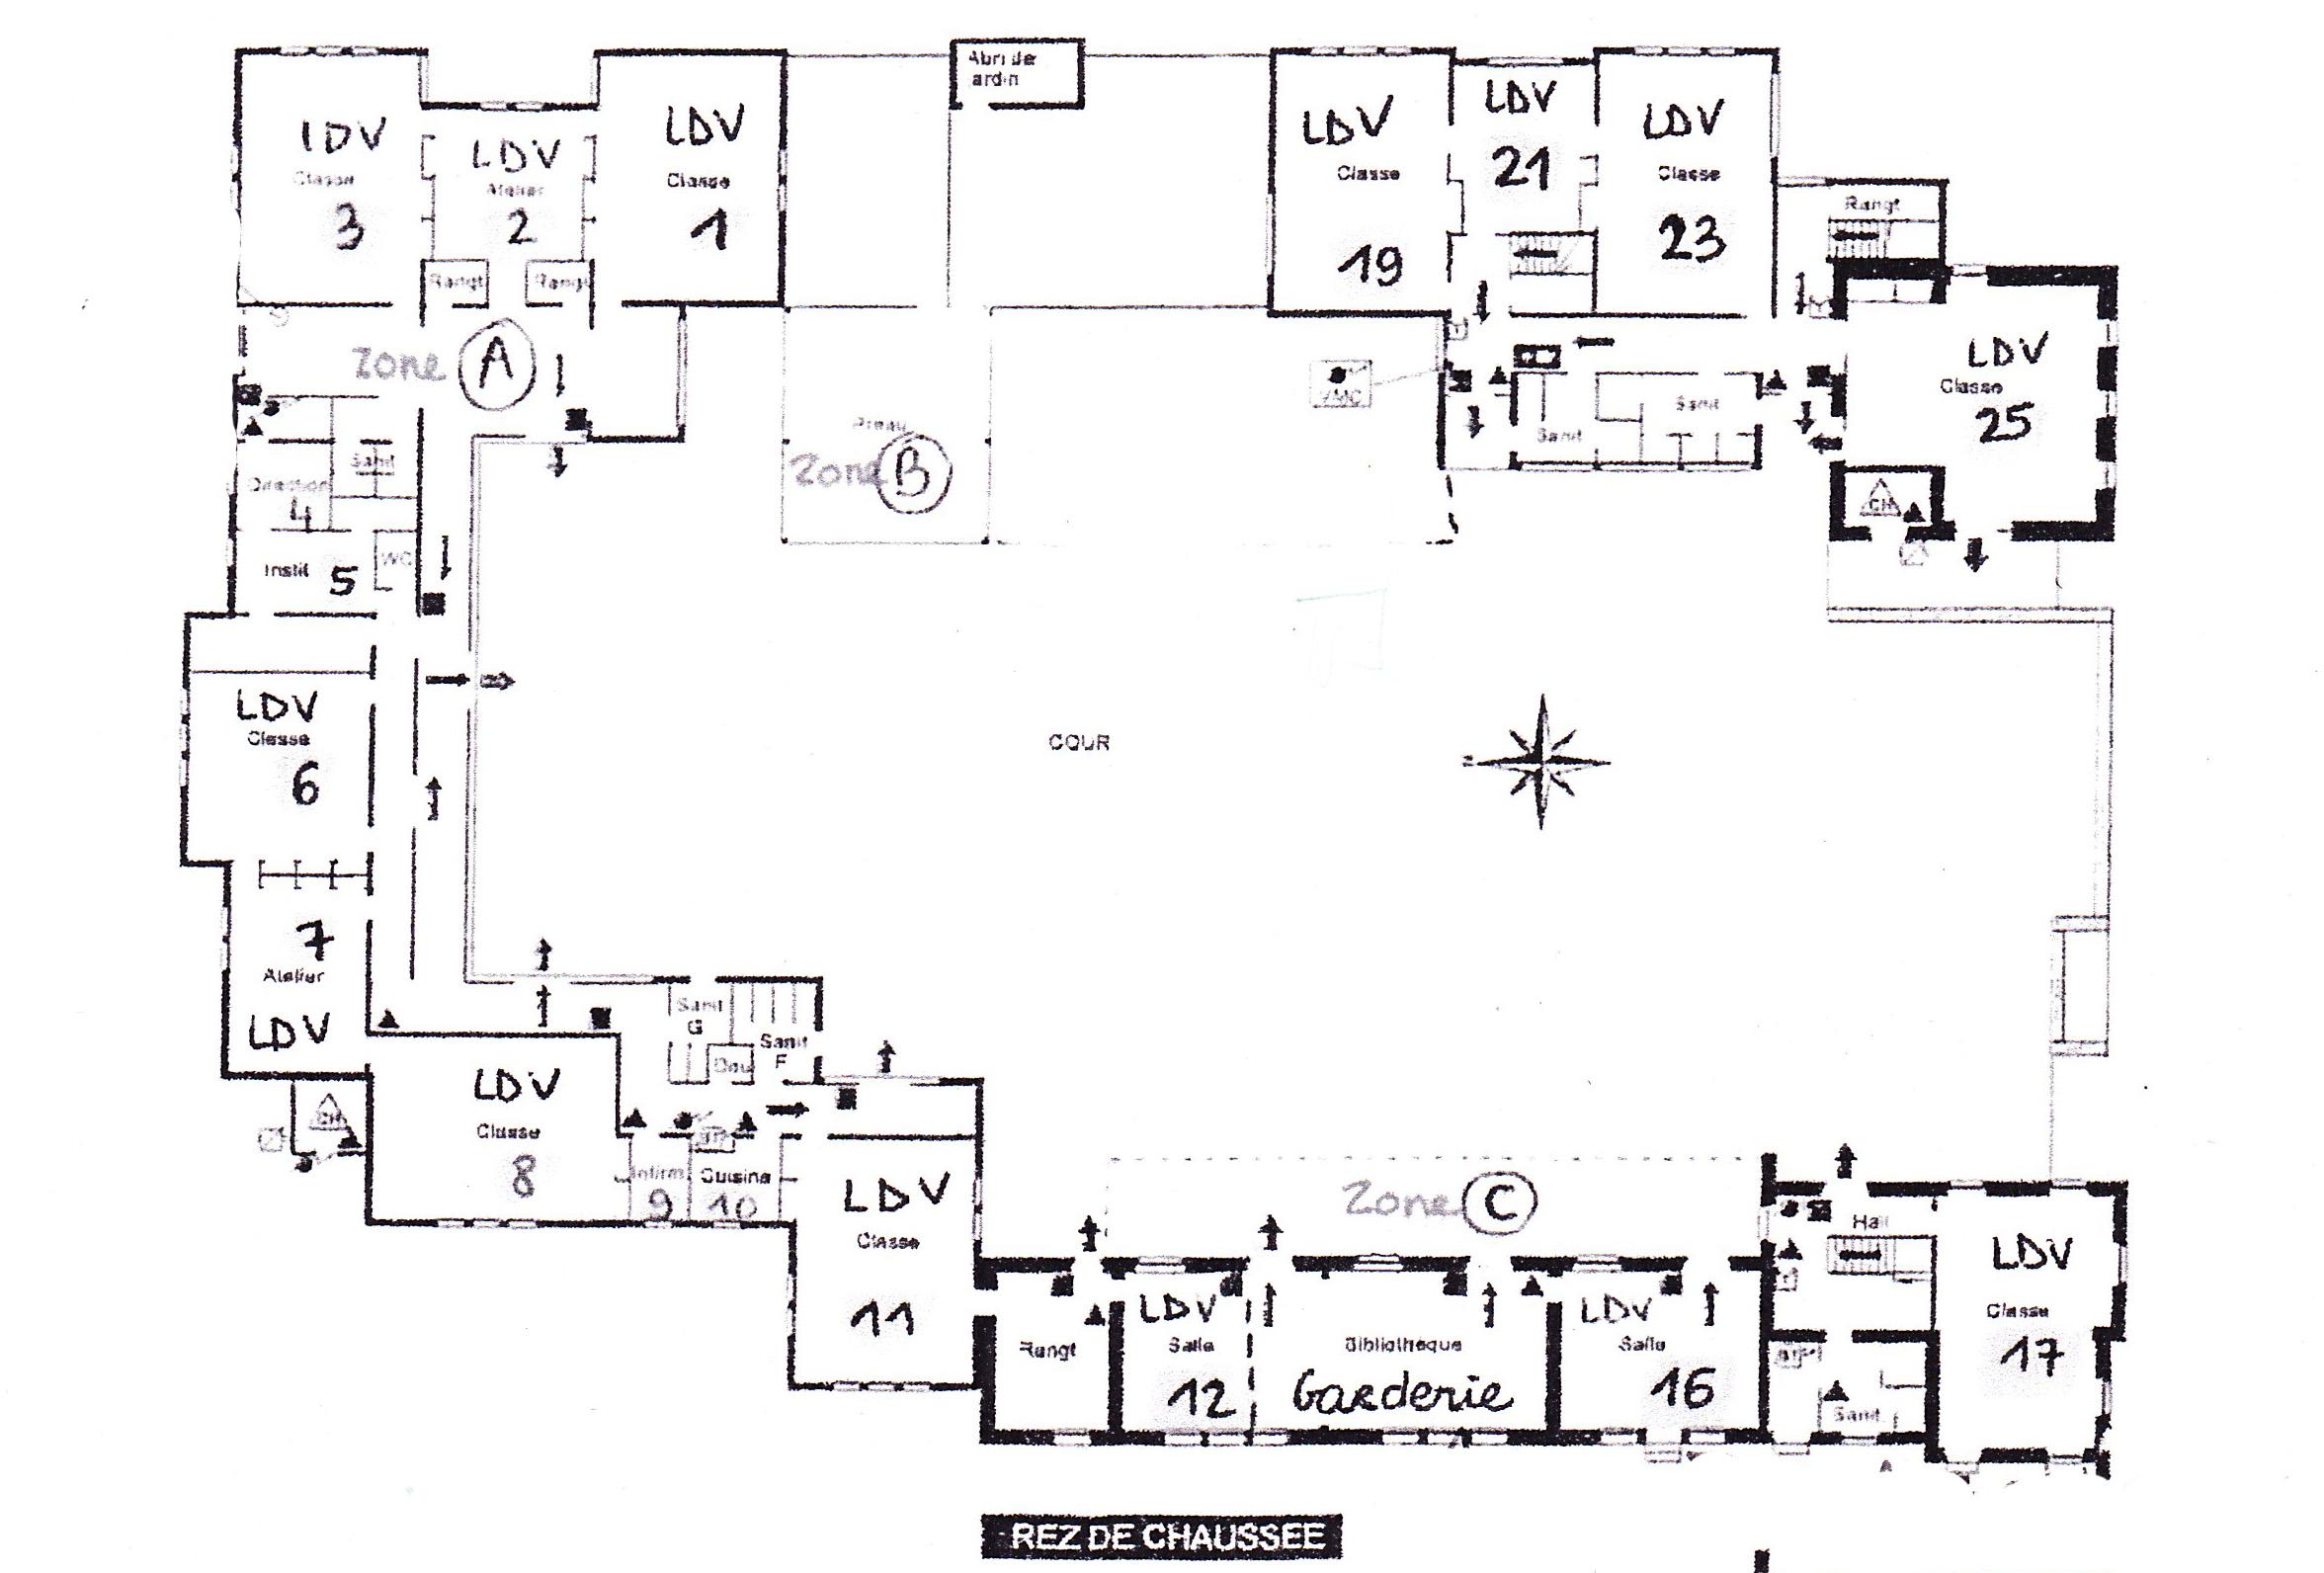 la g o po tique s invite dans une cole primaire c a m t a r. Black Bedroom Furniture Sets. Home Design Ideas